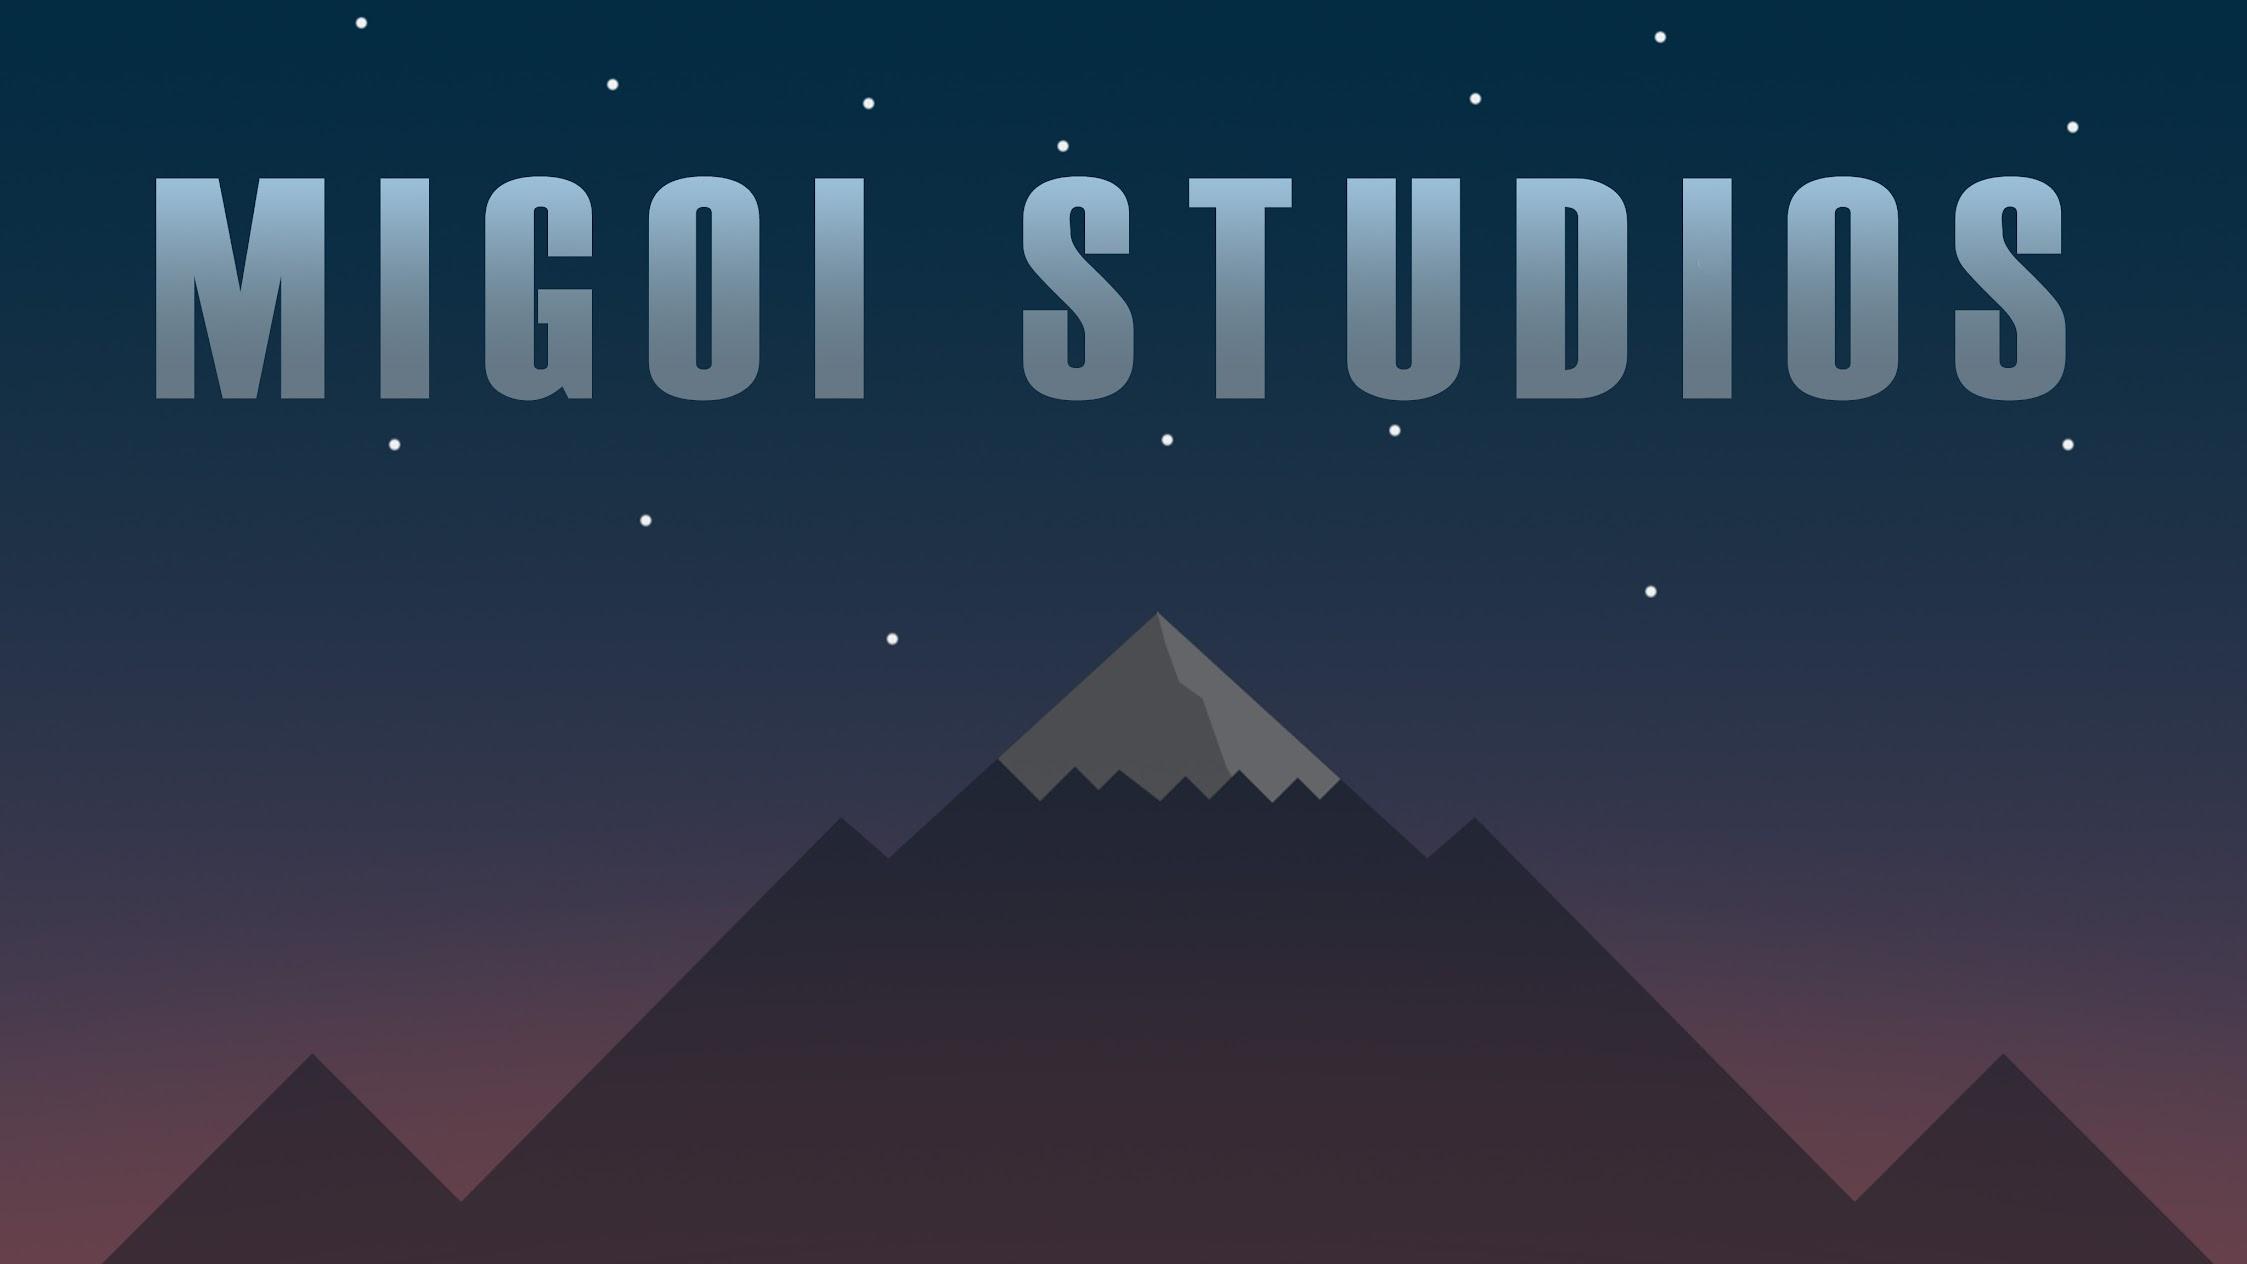 Migoi Studios